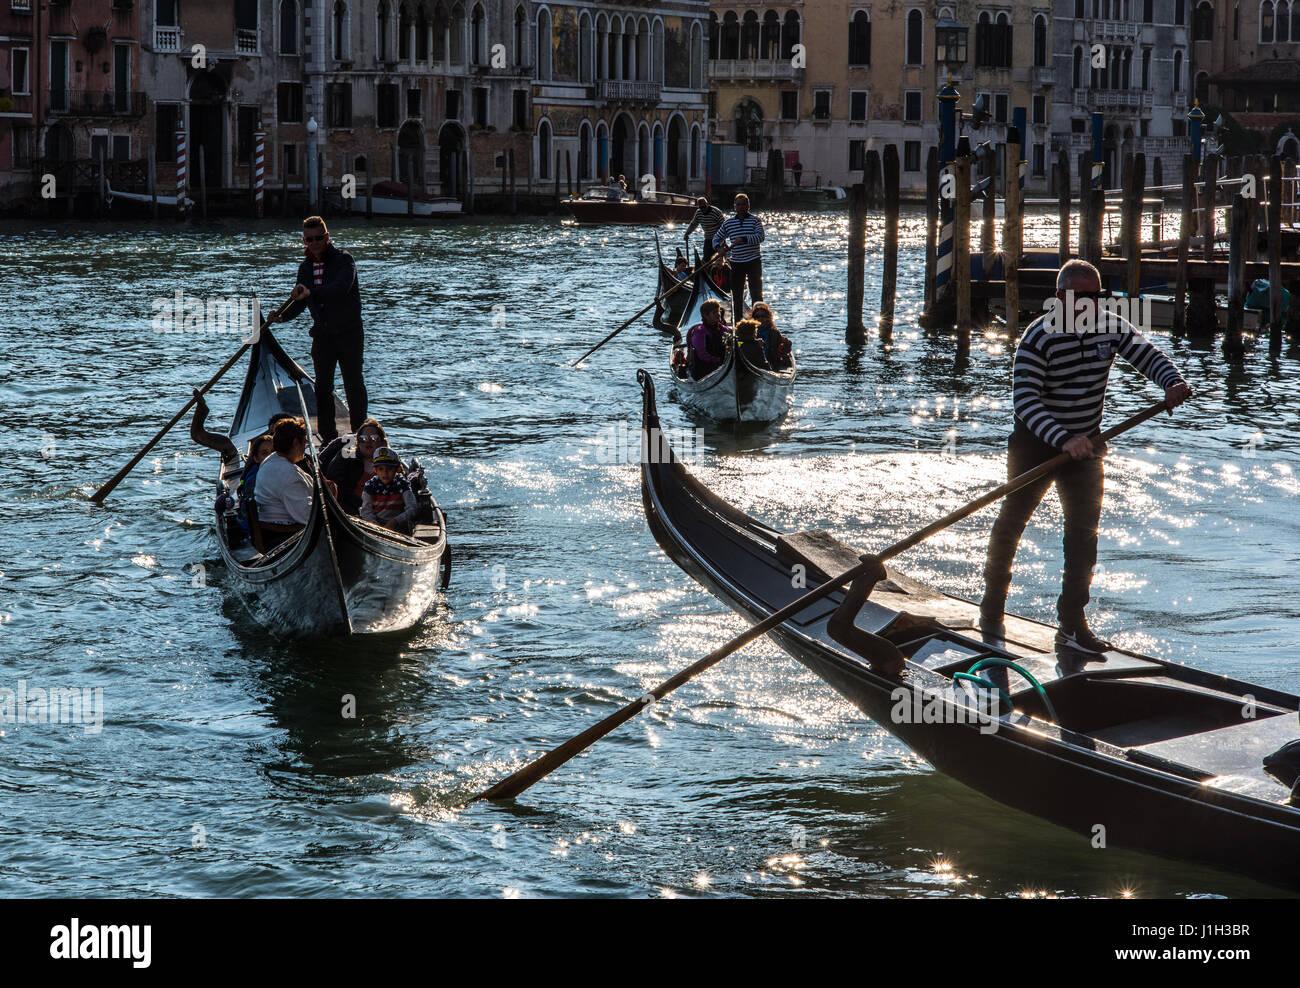 Gondolas silhouetted against Grand Canal in evening near Ponte dell'Accademia bridge, Venice - Stock Image